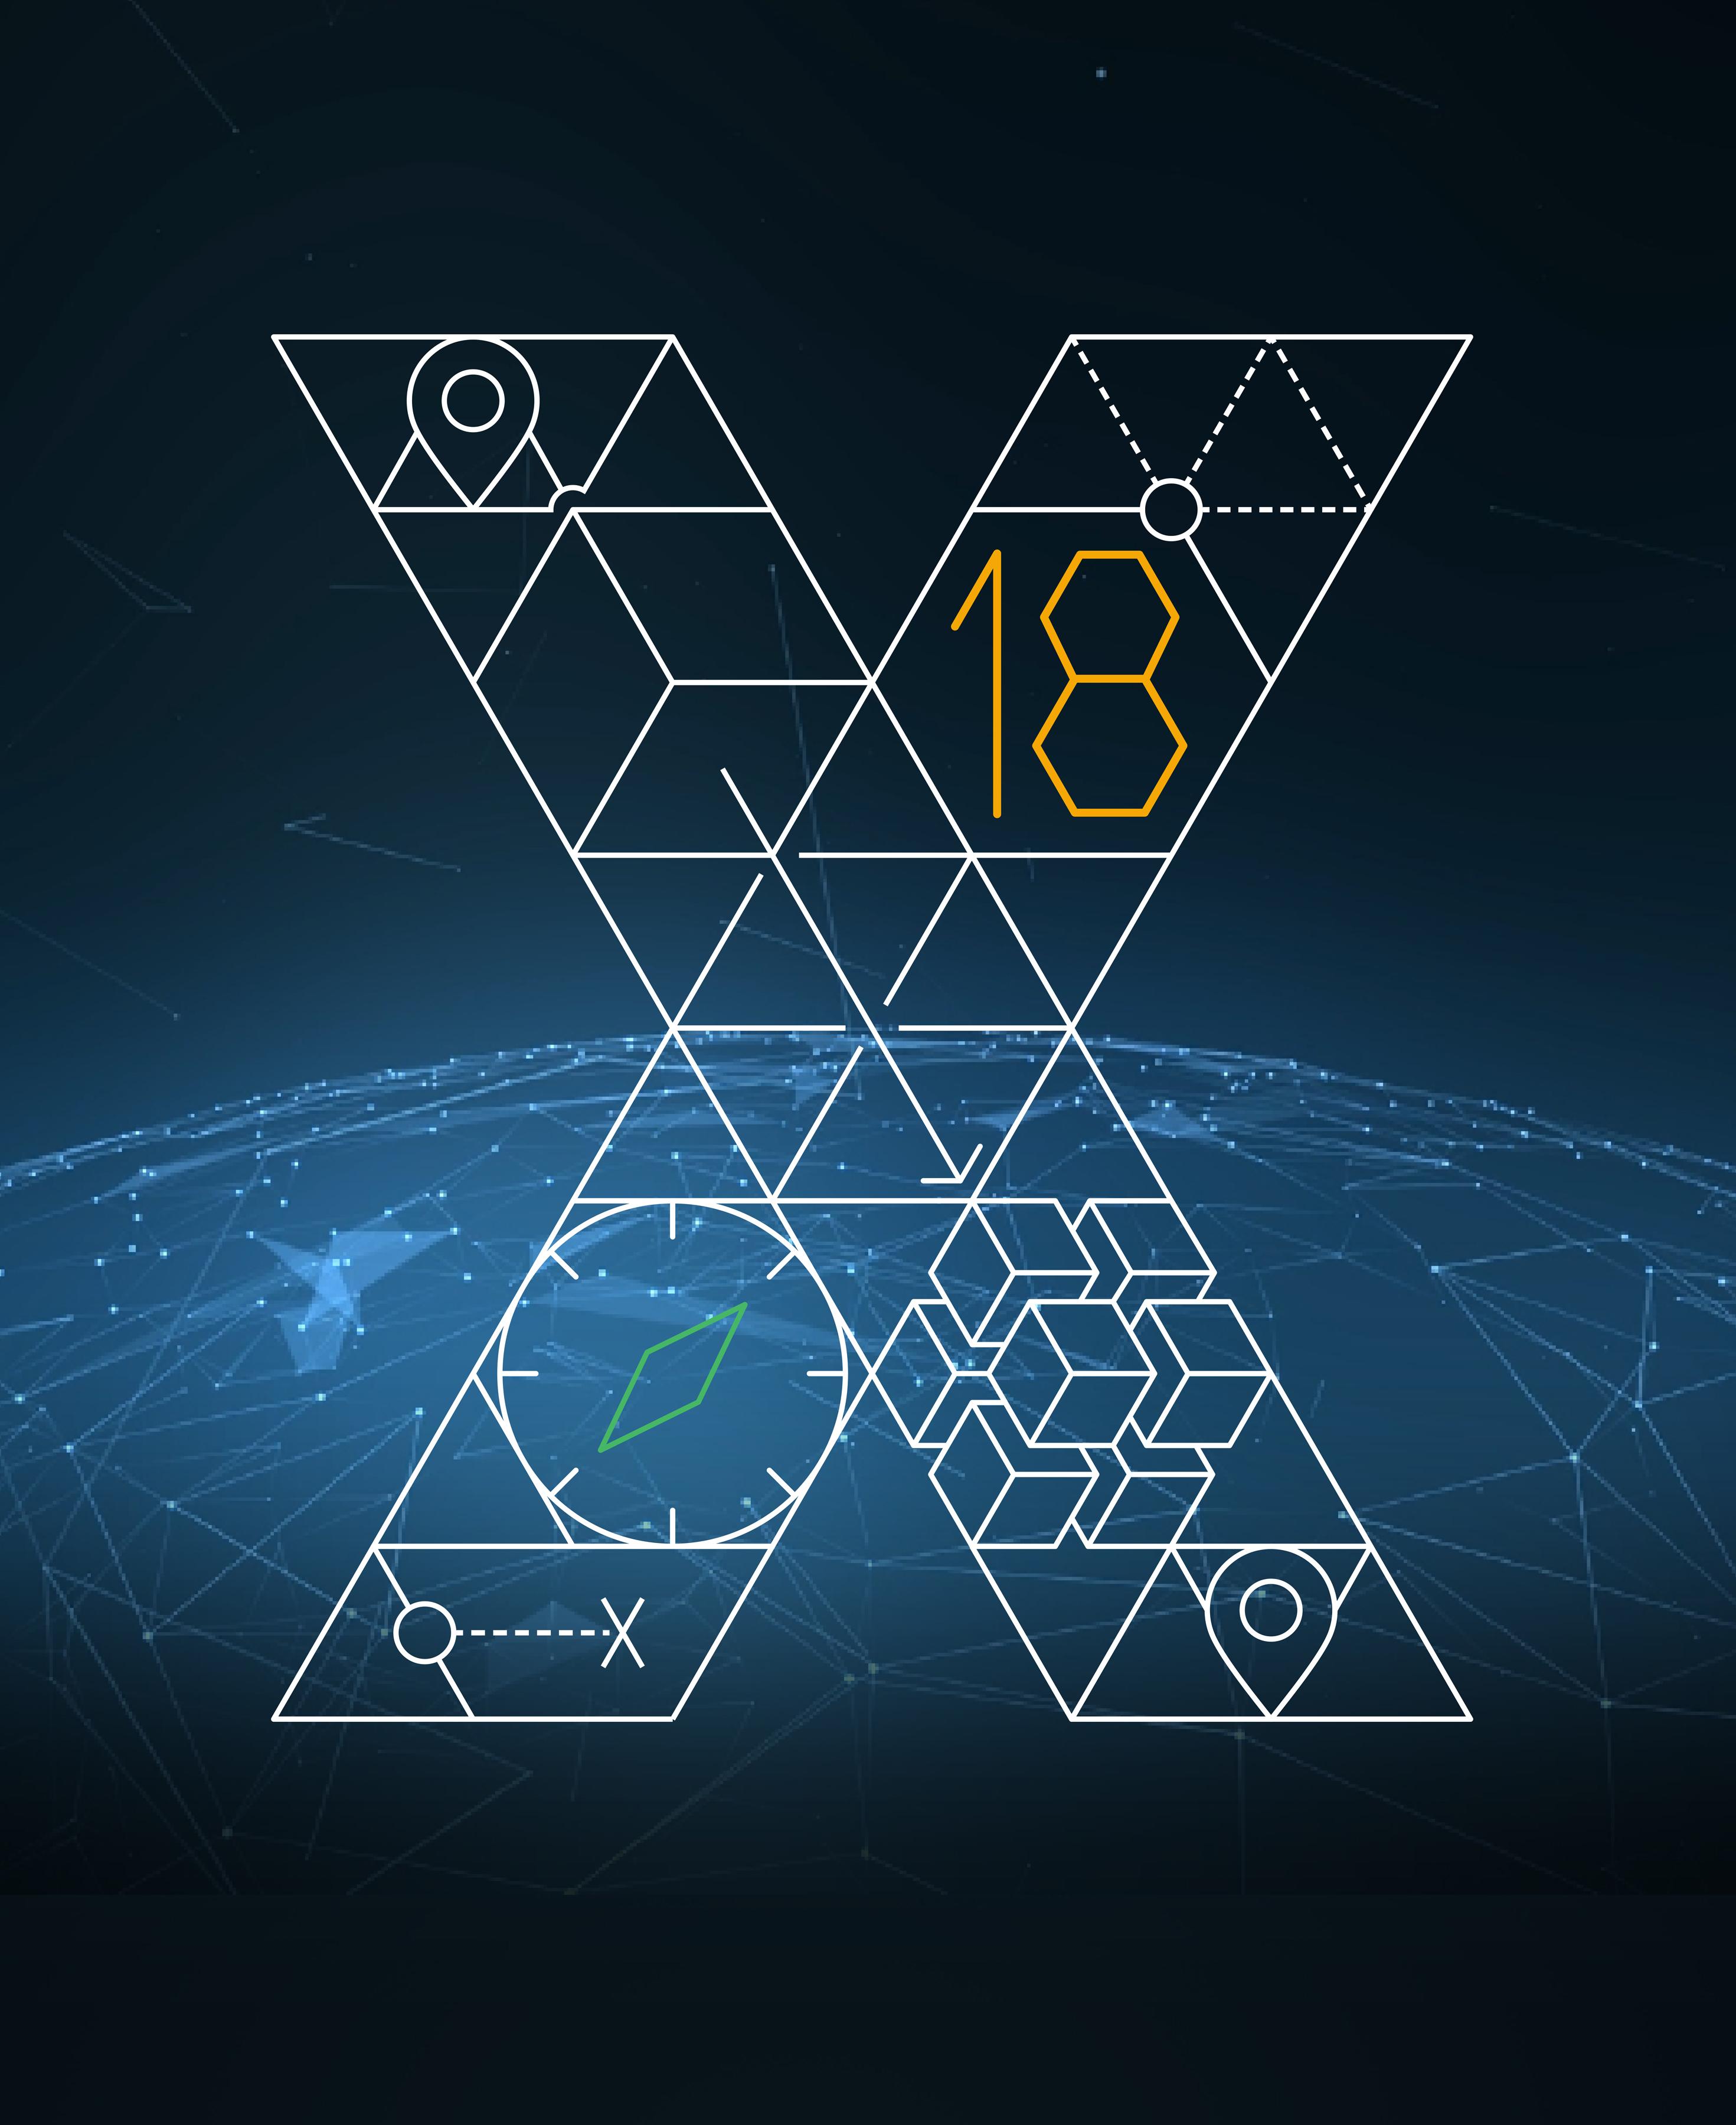 NGINX Conf 2018